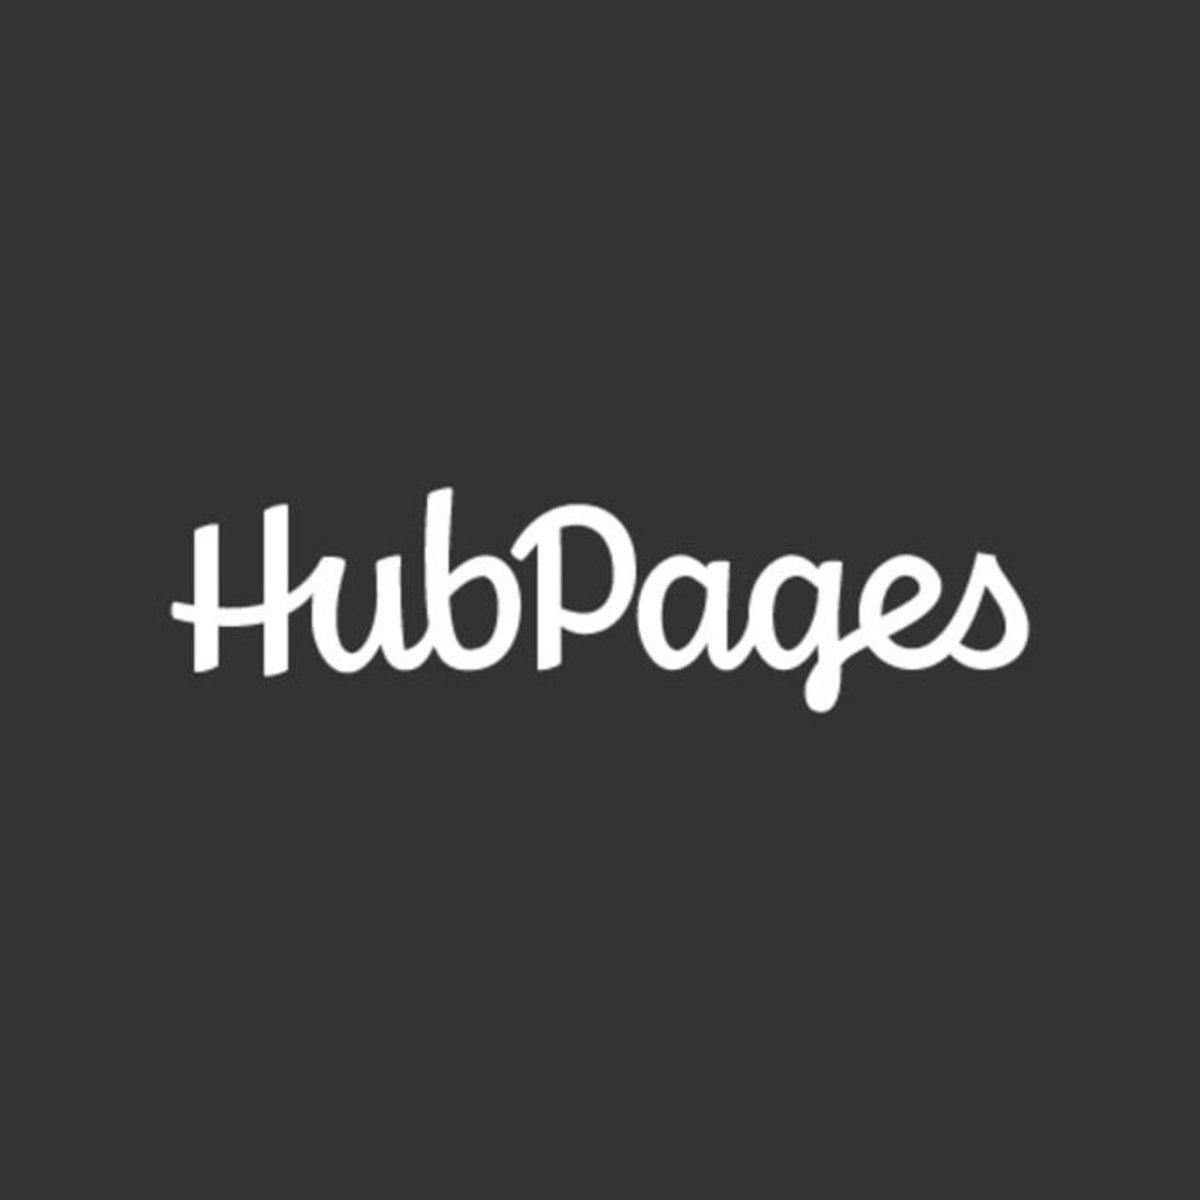 make-me-happy-hubpages